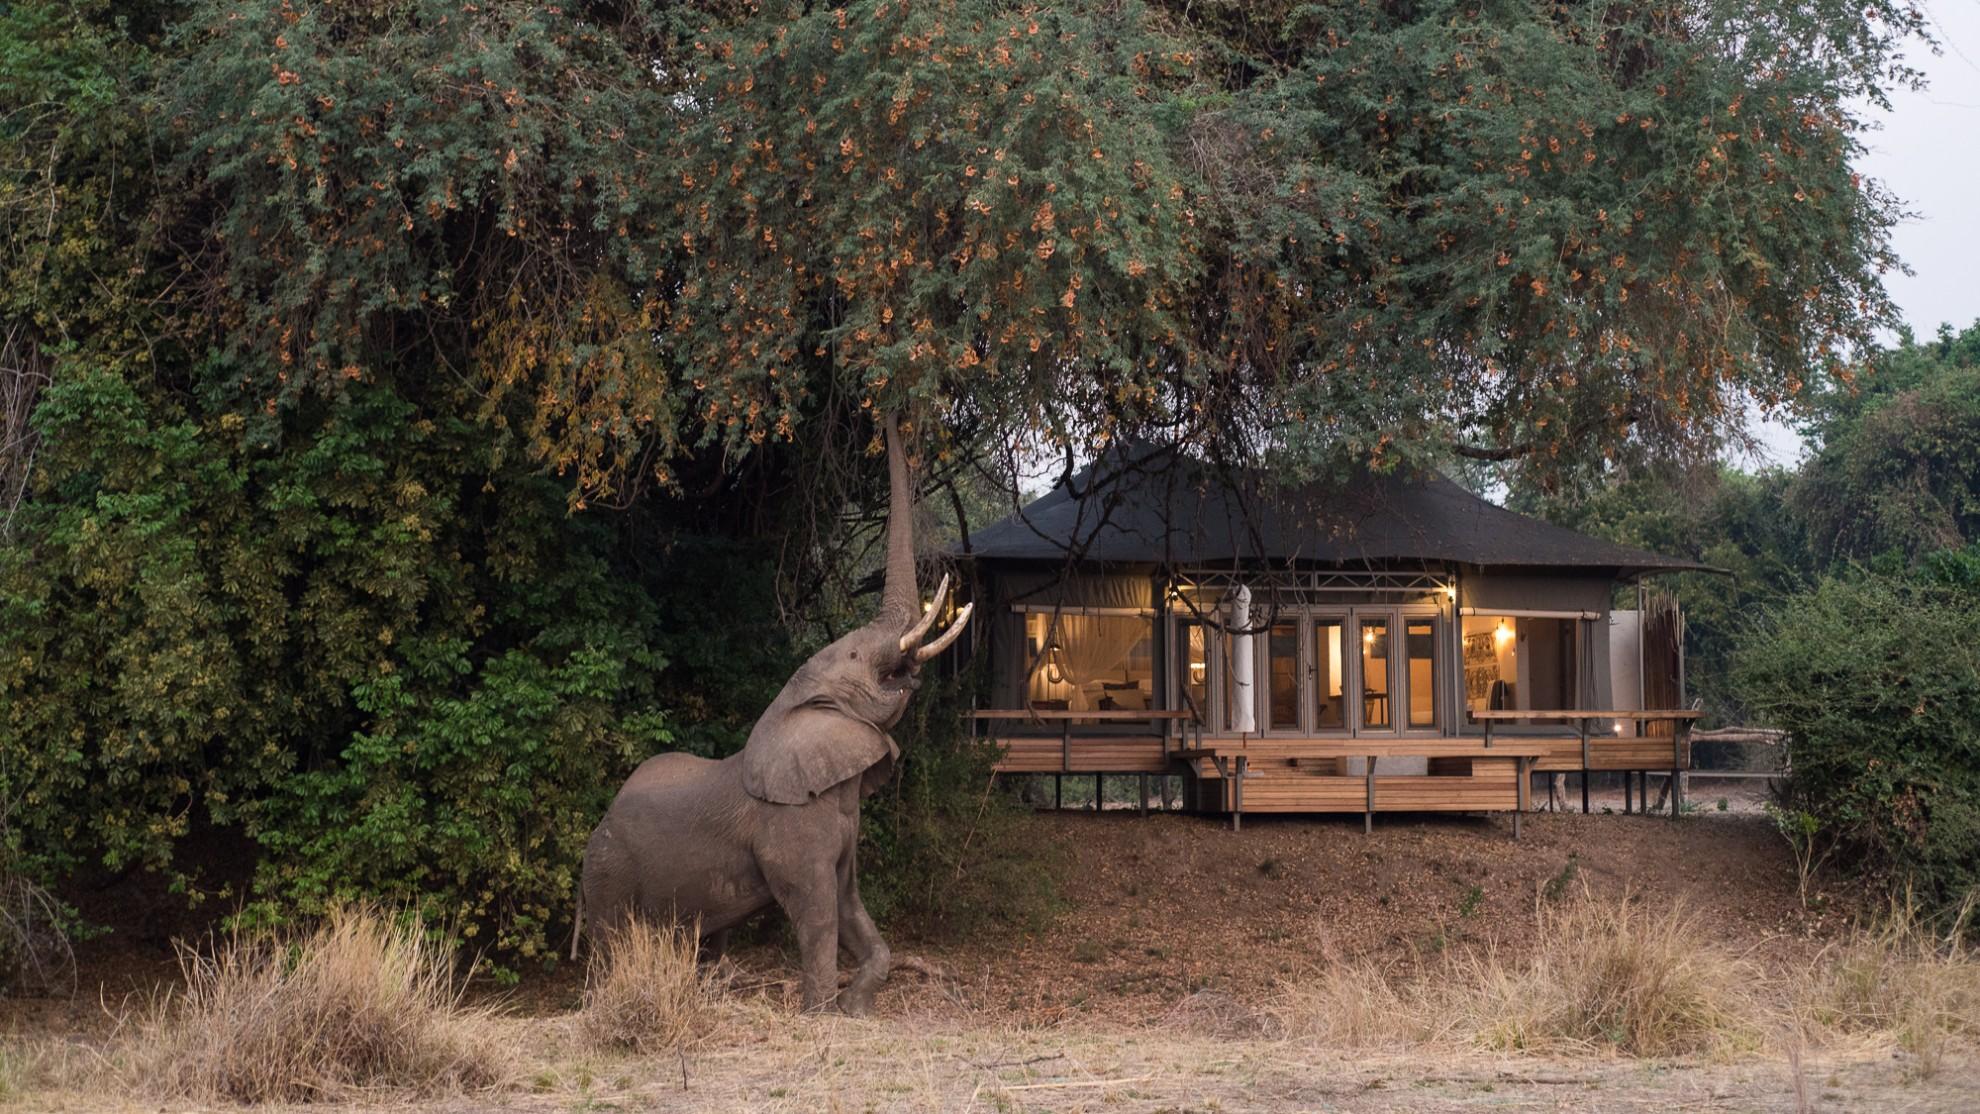 chikwenya_wildlife_elephant eating fruit in front of camp